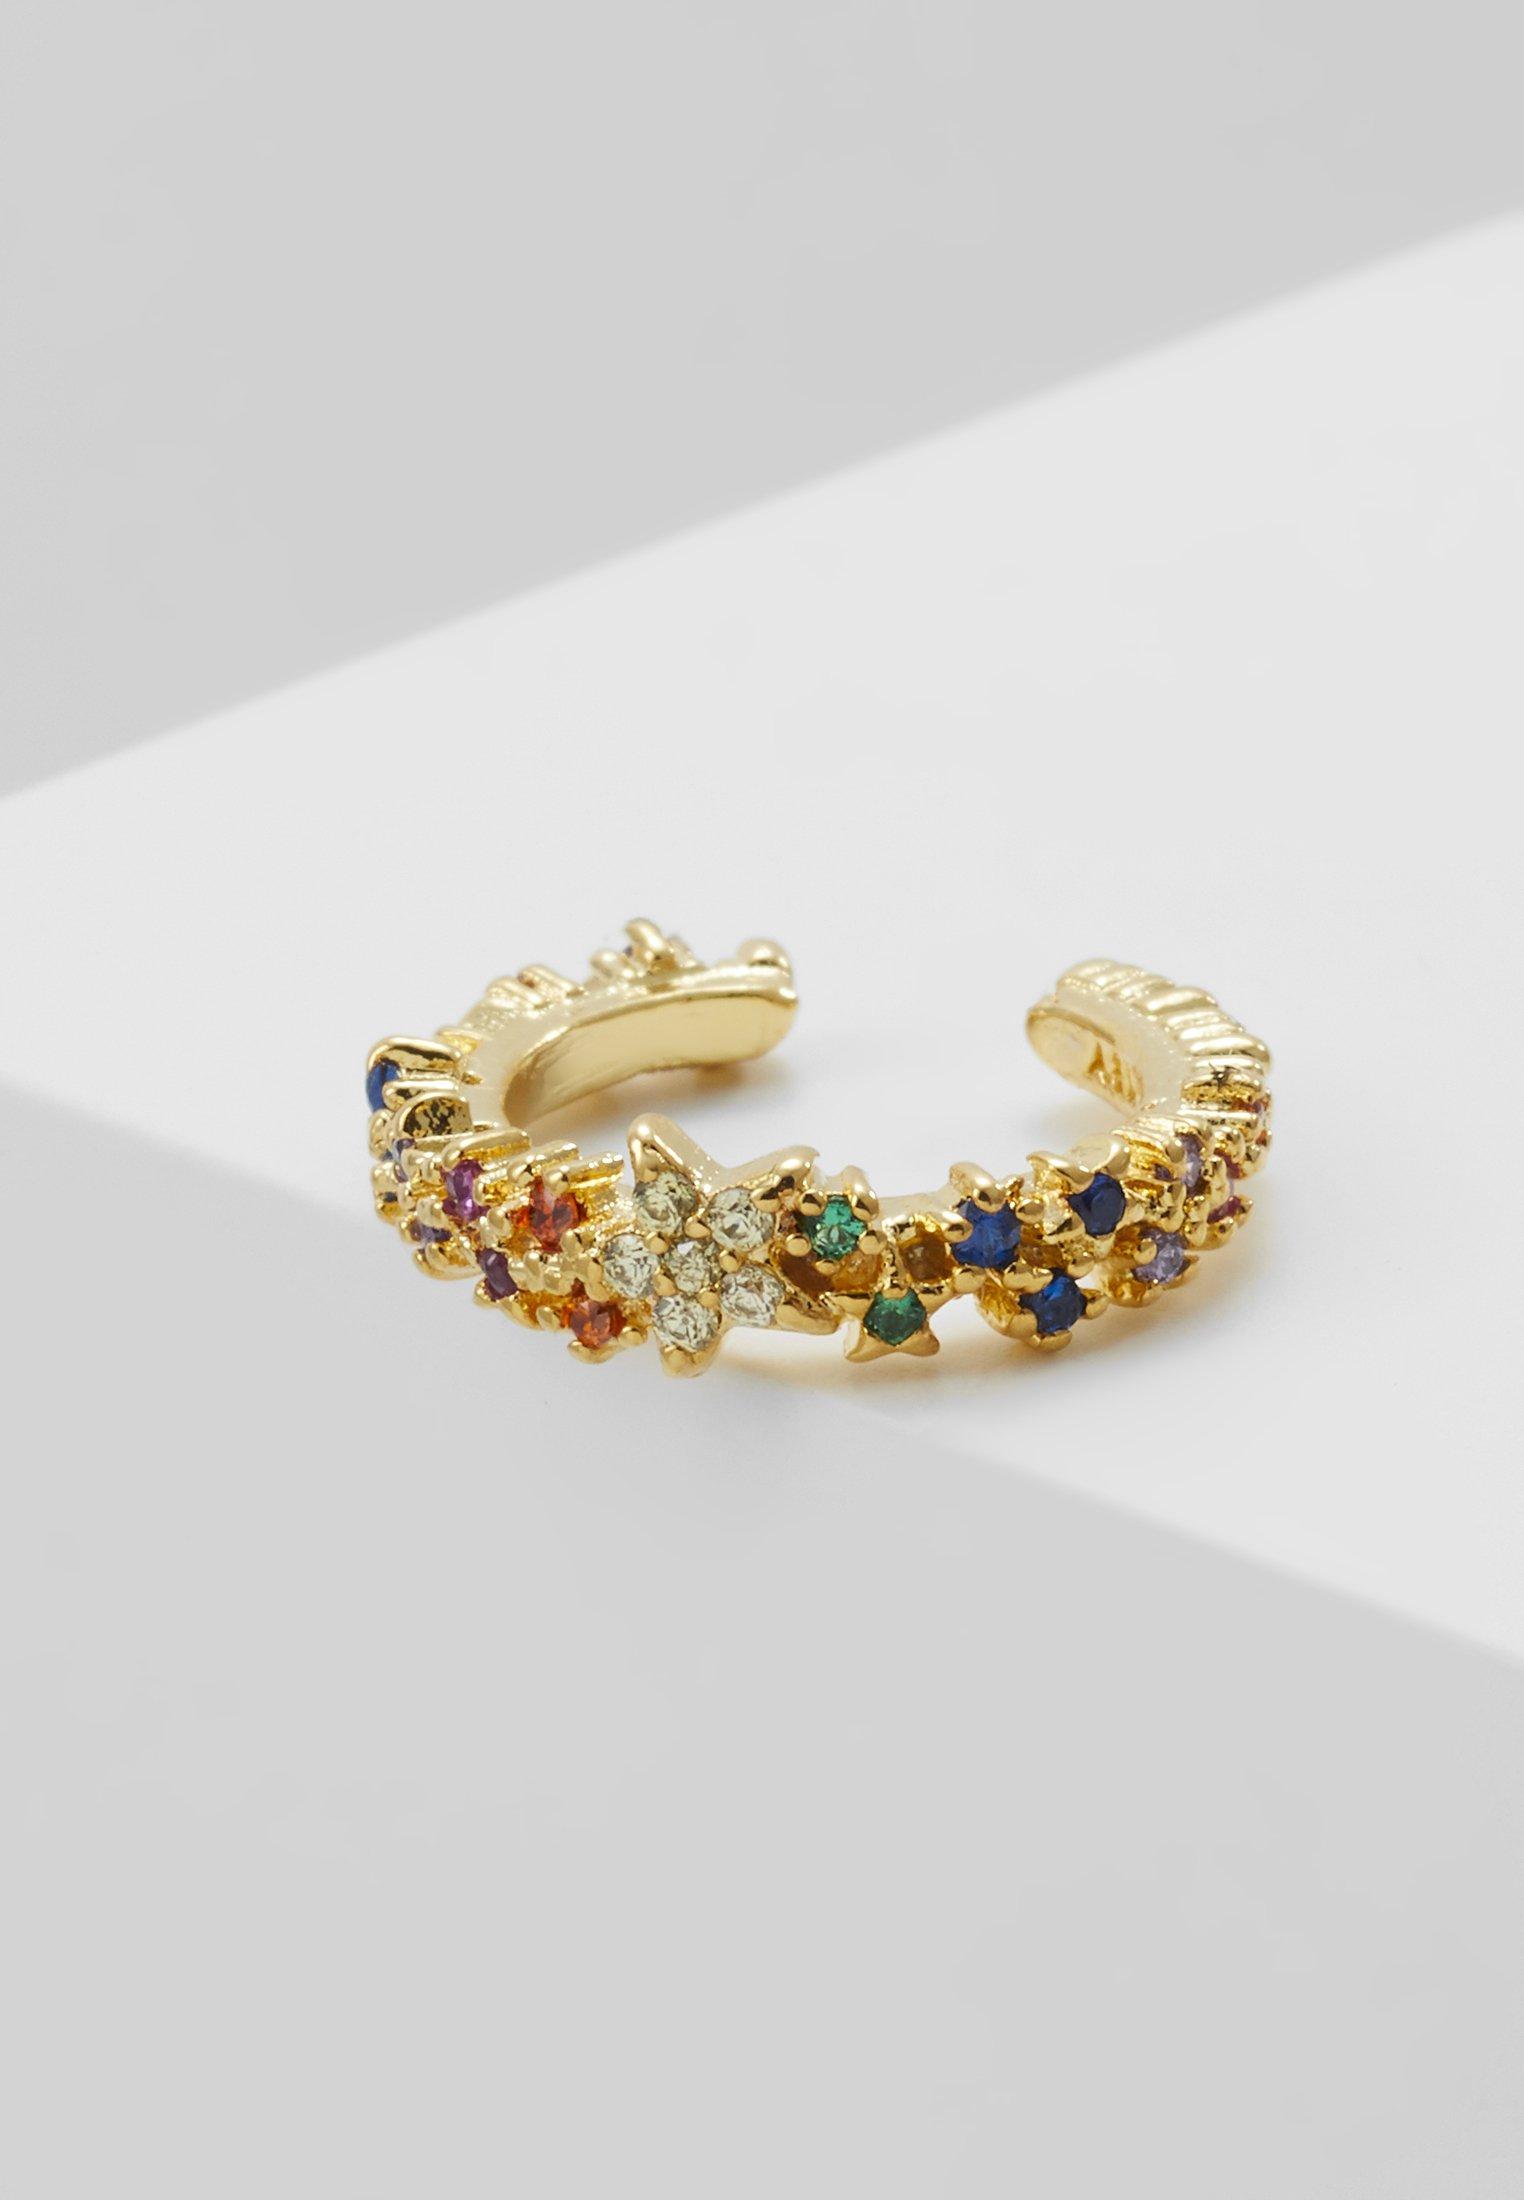 Nice Good Selling Accessories Astrid & Miyu RAINBOW STAR EAR CUFF Earrings gold-coloured MiTalMQLt YVOVdSA9C